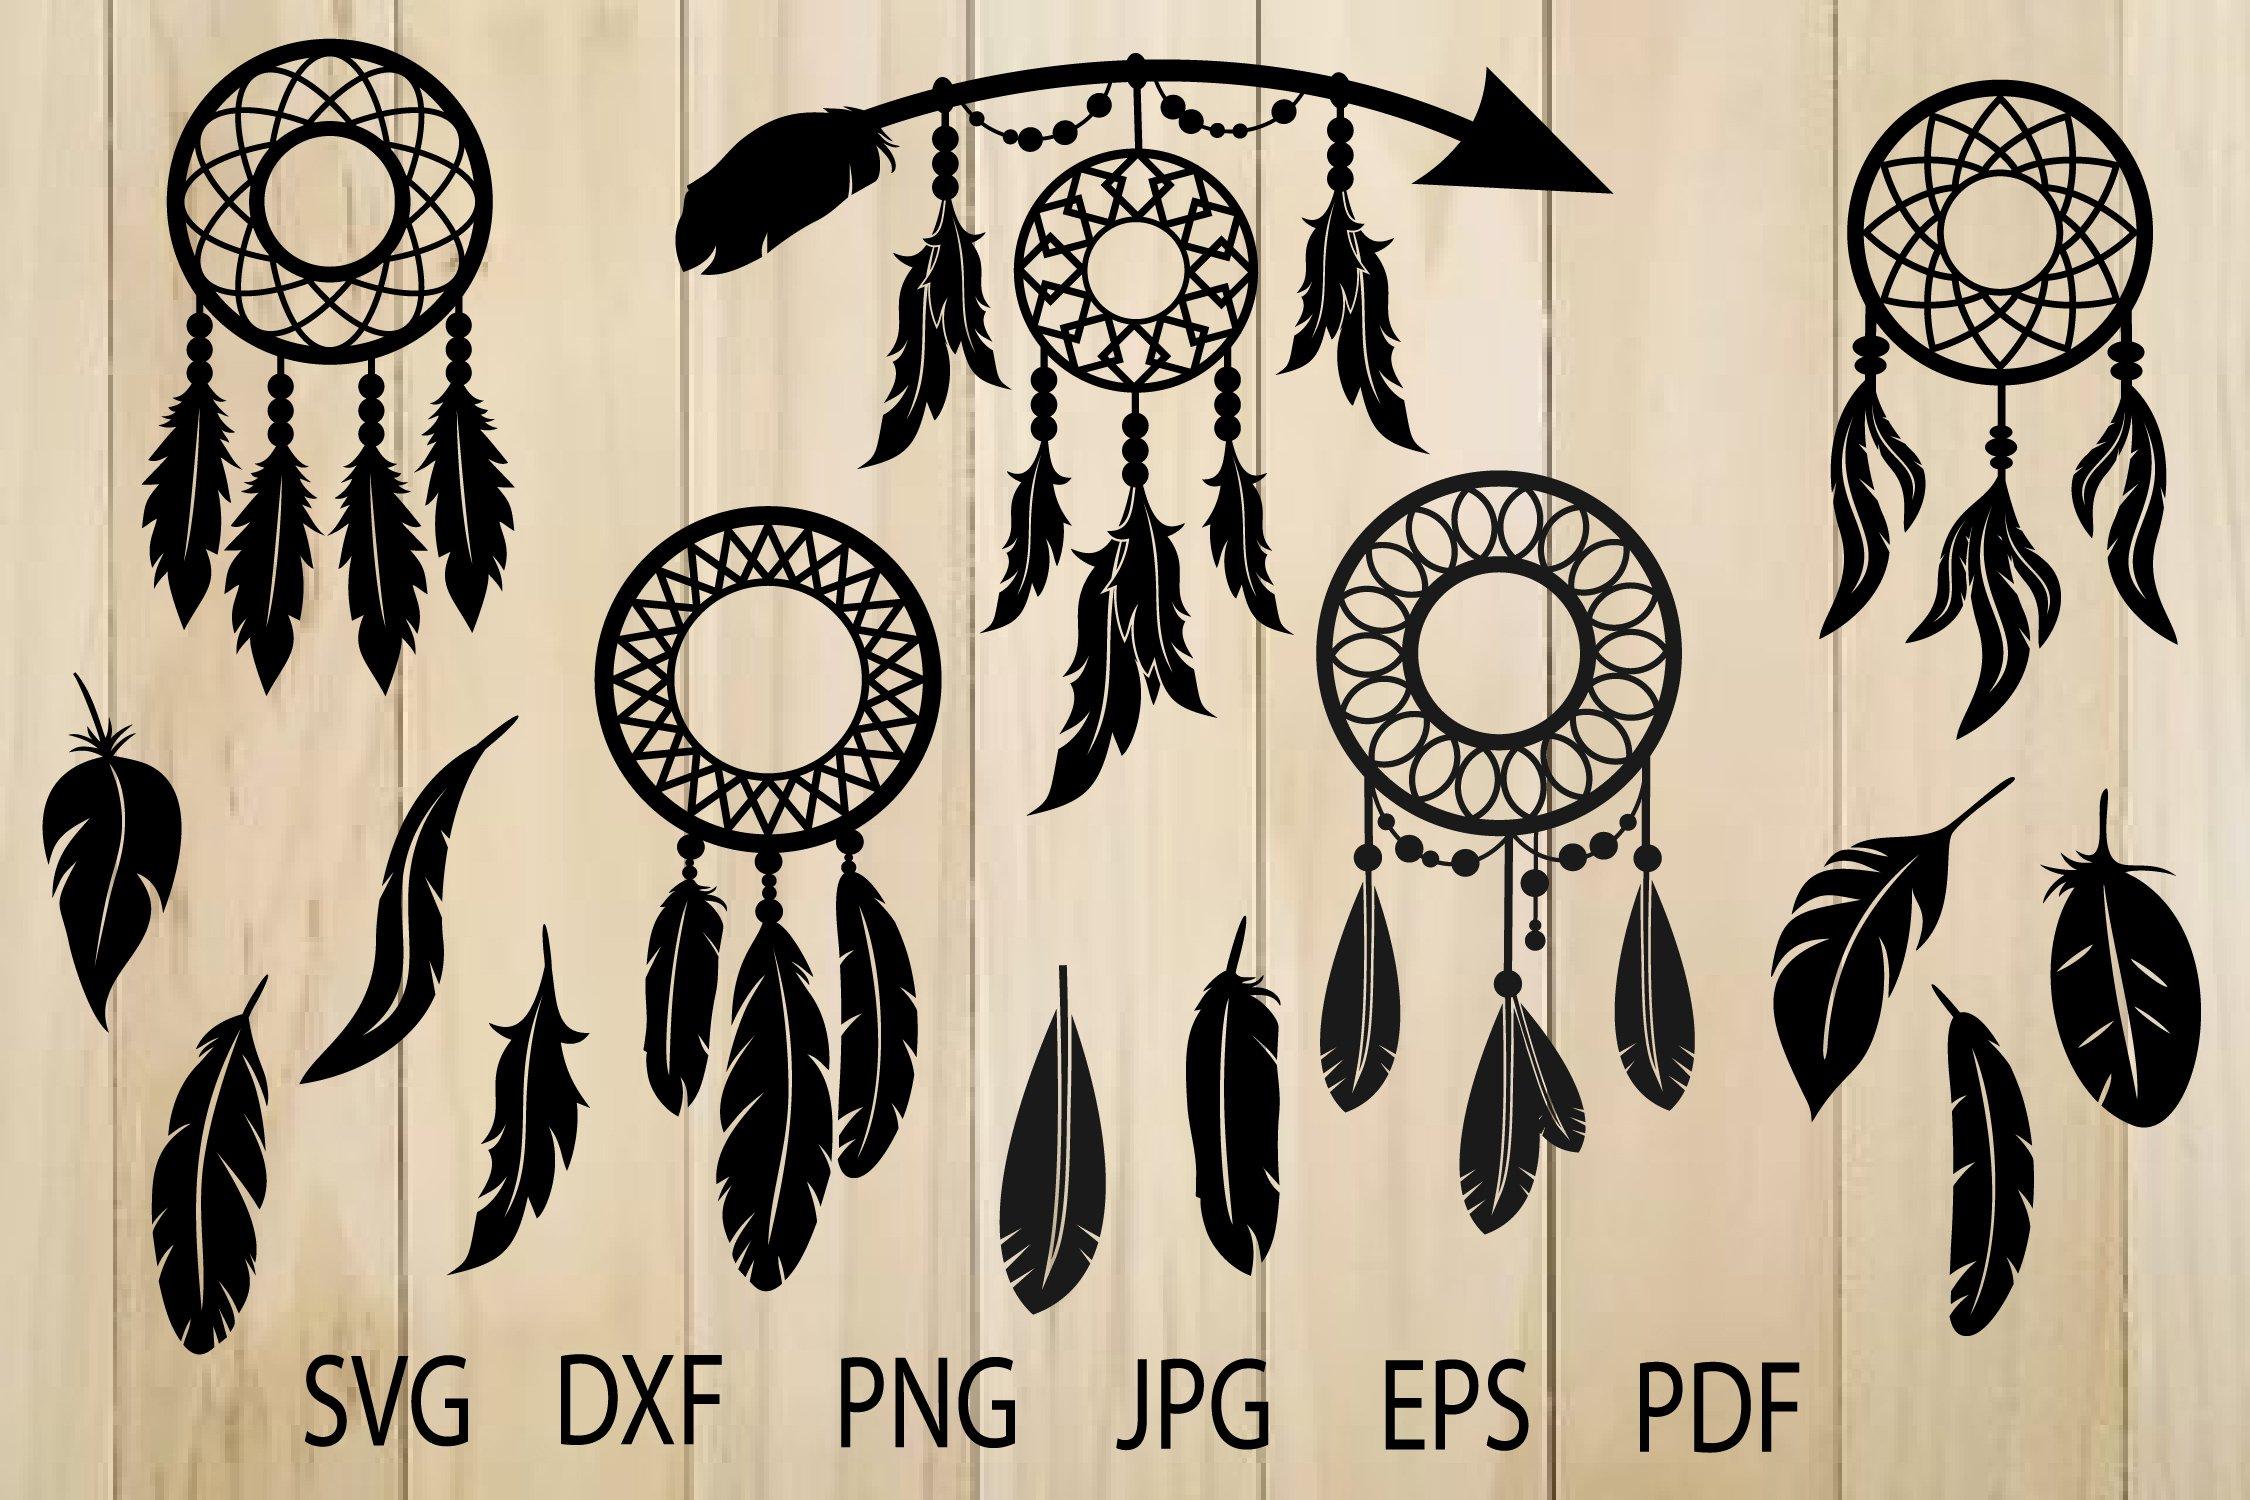 svg file for cricut dreamcatcher Dream catcher svg dxf Silhouette monogram frame svg Cricut feathers wedding svg Cut file design